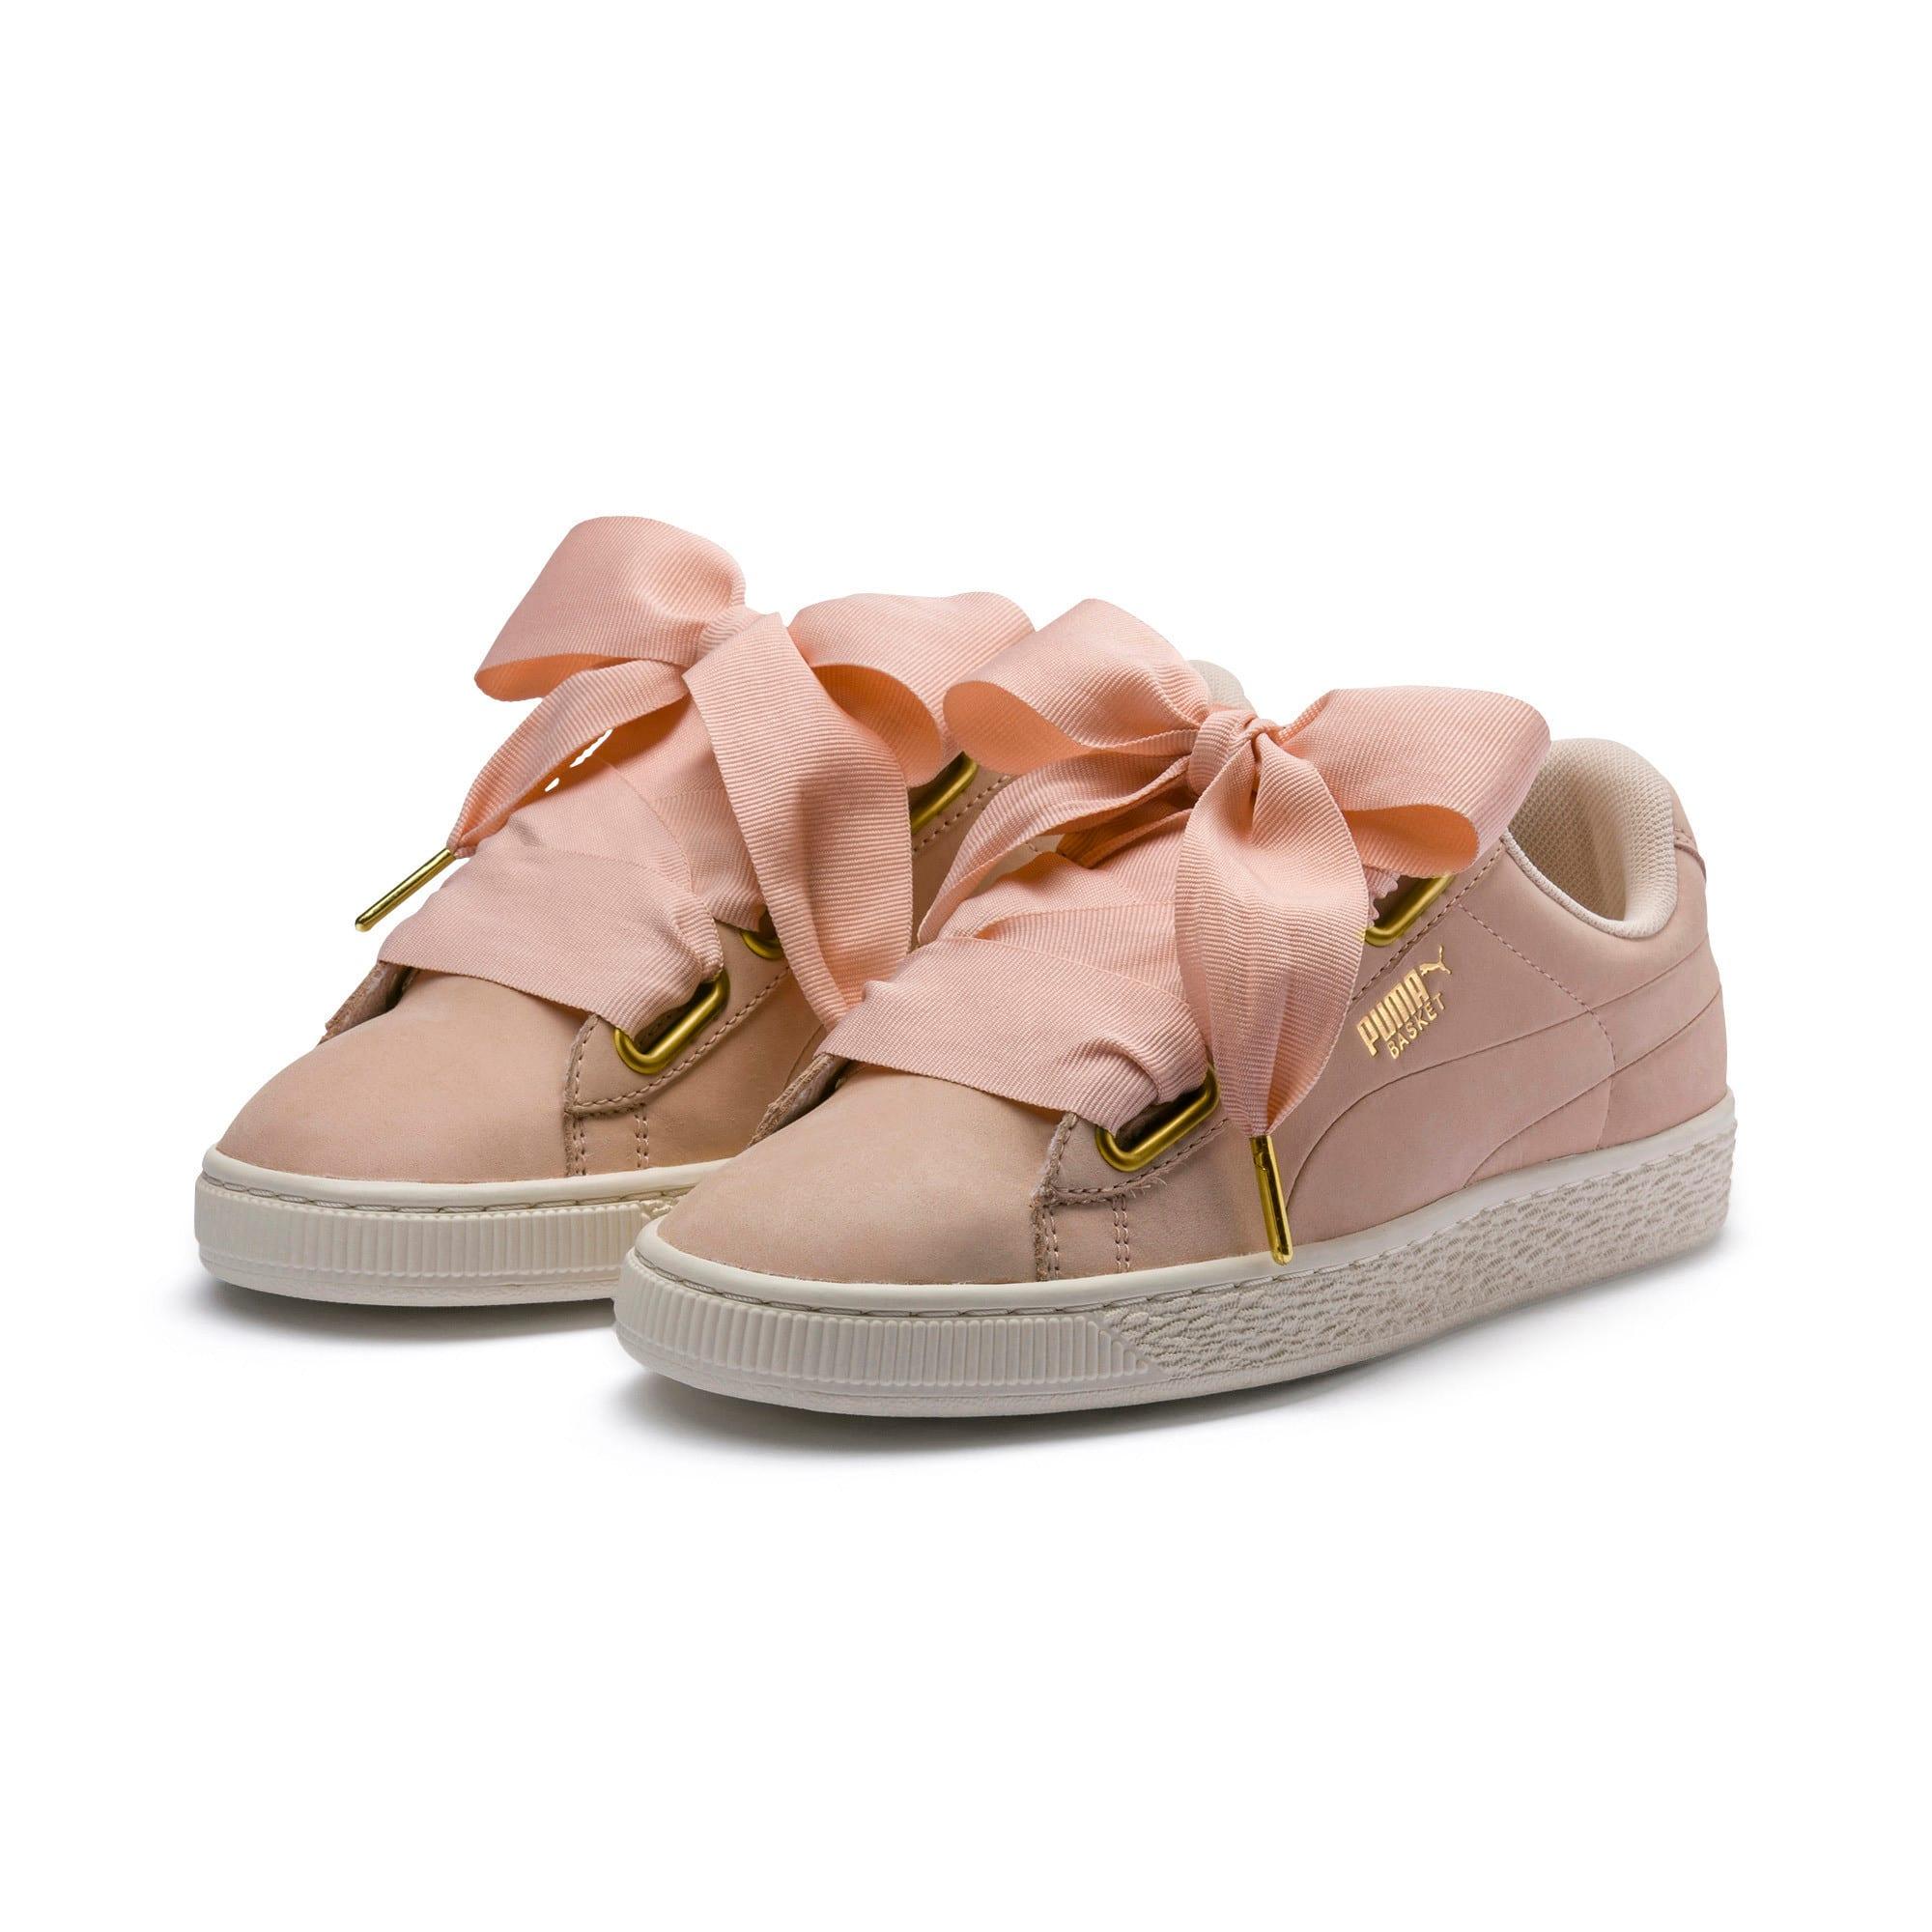 Thumbnail 5 of Basket Heart Soft Women's Sneakers, Cream Tan-Marshmallow, medium